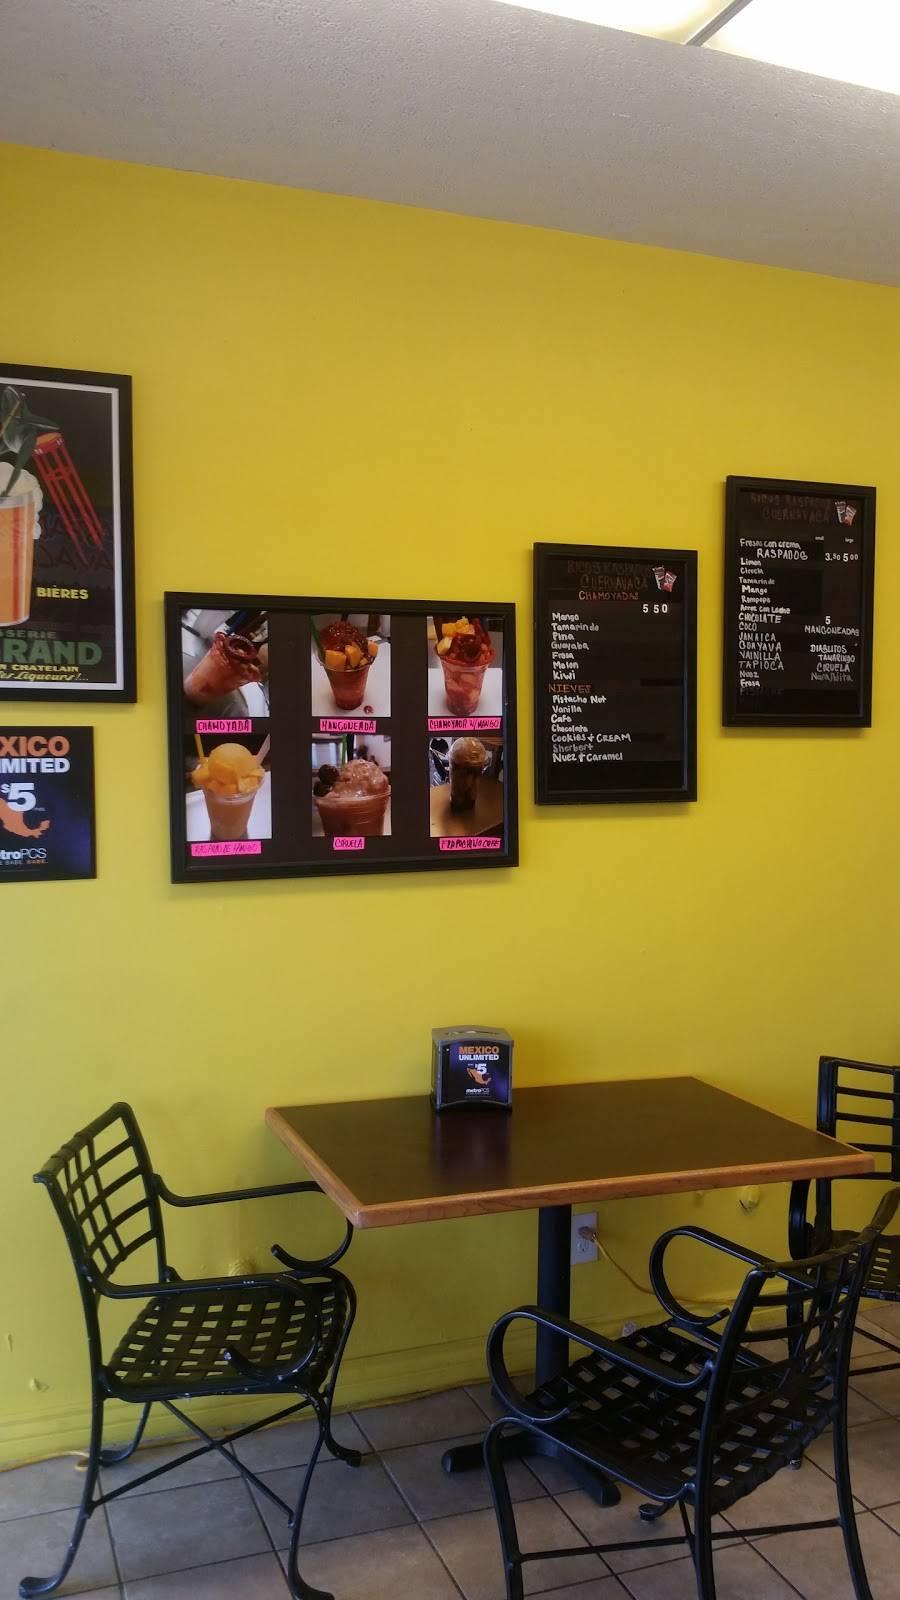 Ricos Raspados Cuernavaca - restaurant  | Photo 5 of 10 | Address: 2929 E McDowell Rd, Phoenix, AZ 85008, USA | Phone: (602) 327-9649